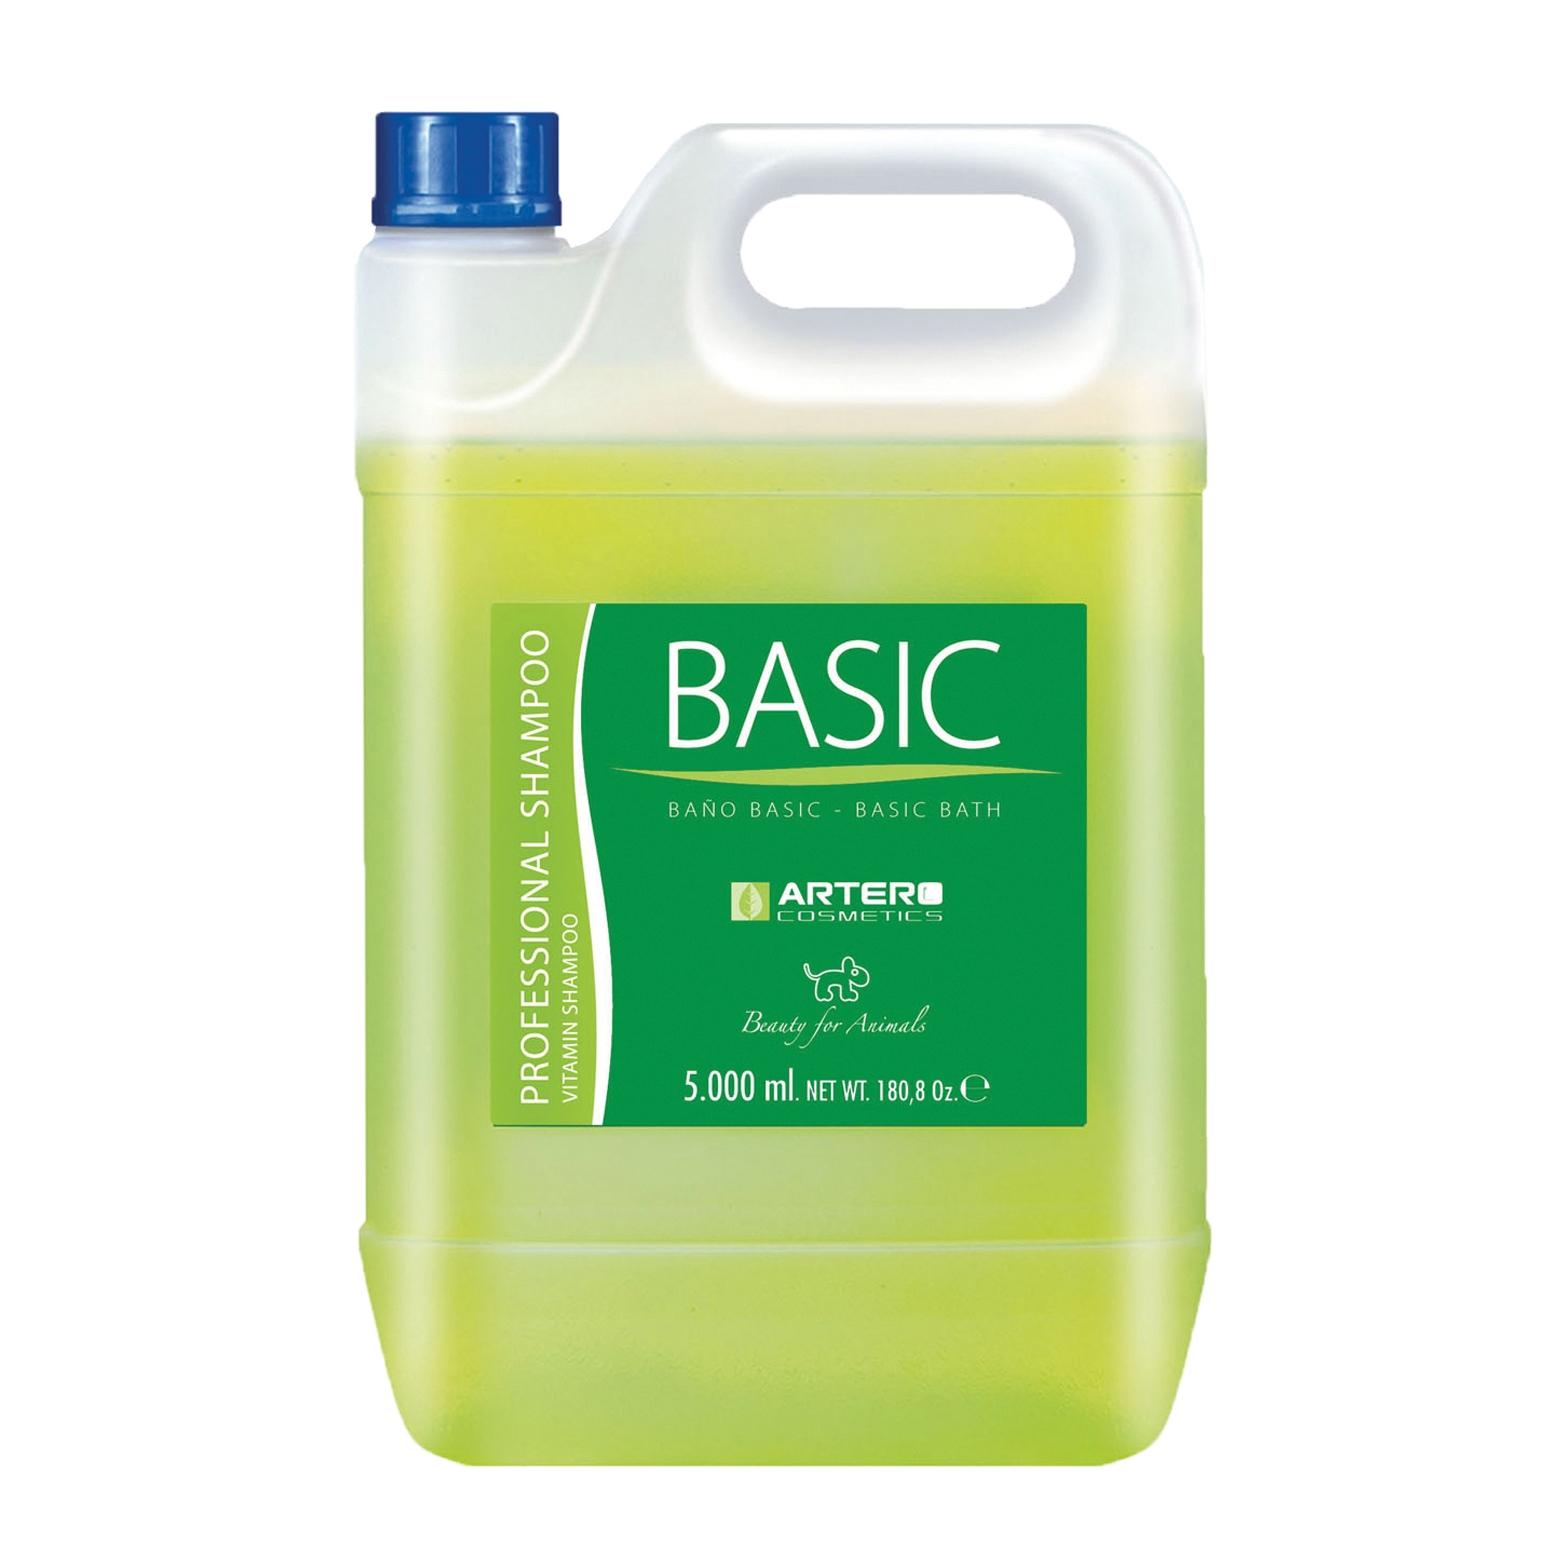 c1062 - Artero Shampoo Neutro 5L